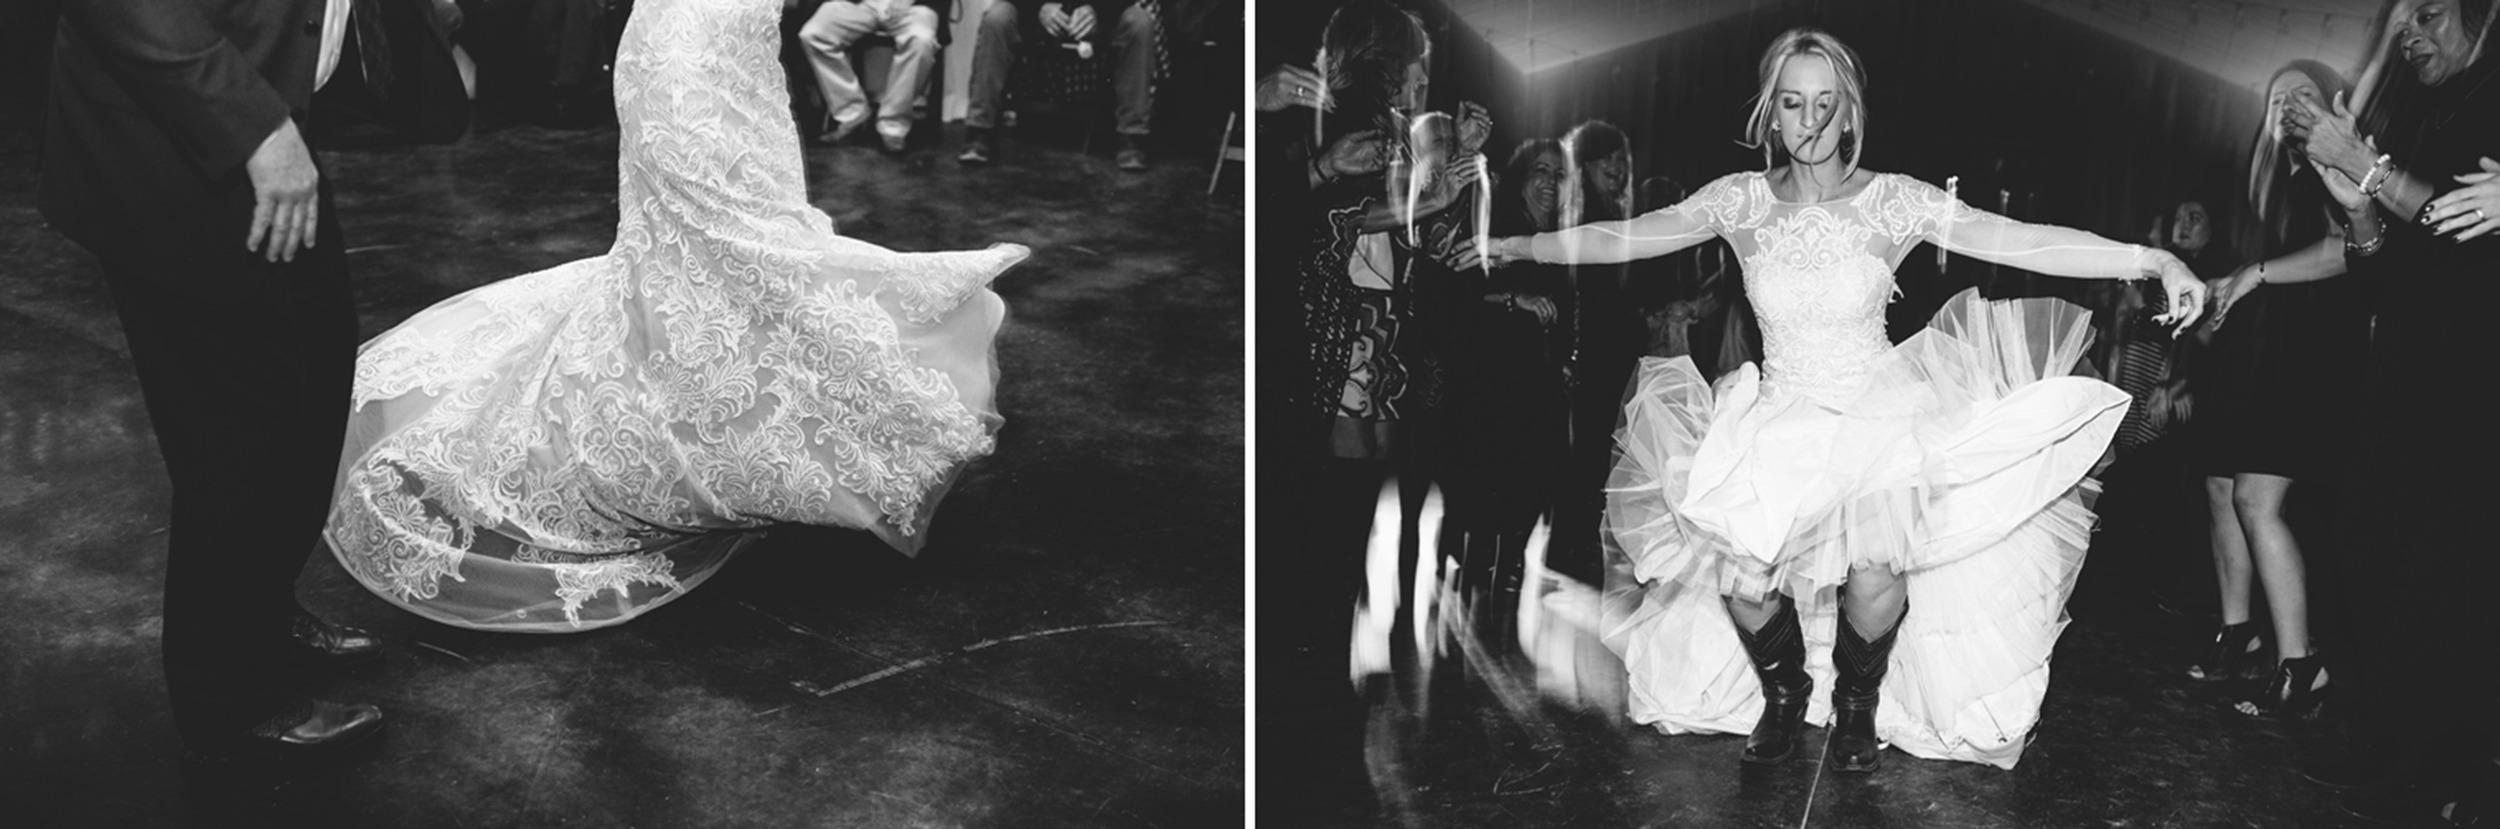 Cotton_Creek_Barn_Winter_Wedding_WeddingPhotographer058.jpg